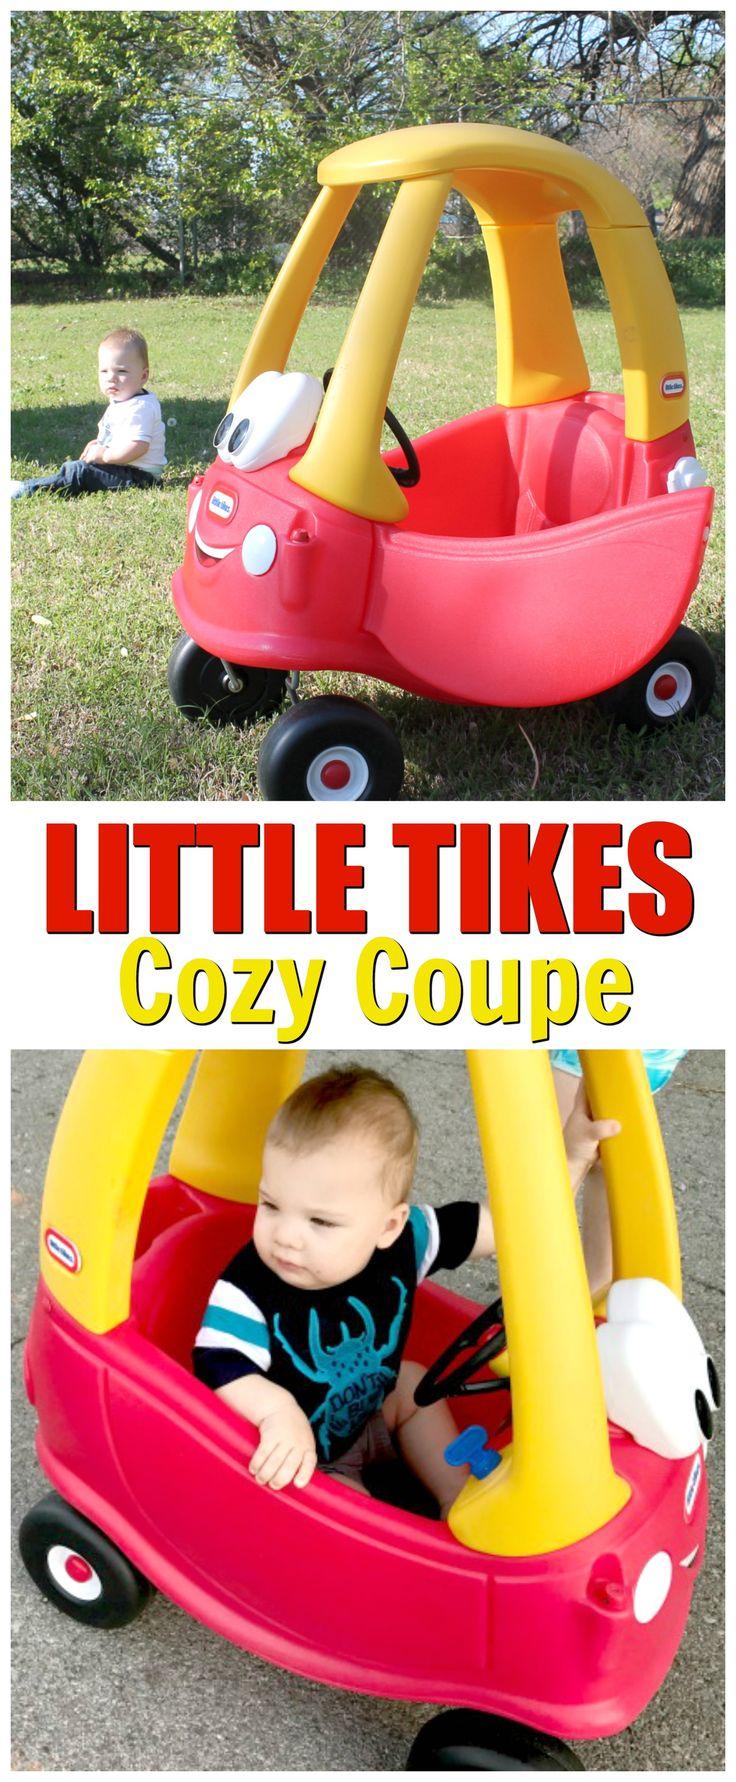 126 best Best Toys For Kids images on Pinterest | Spinner toy ...